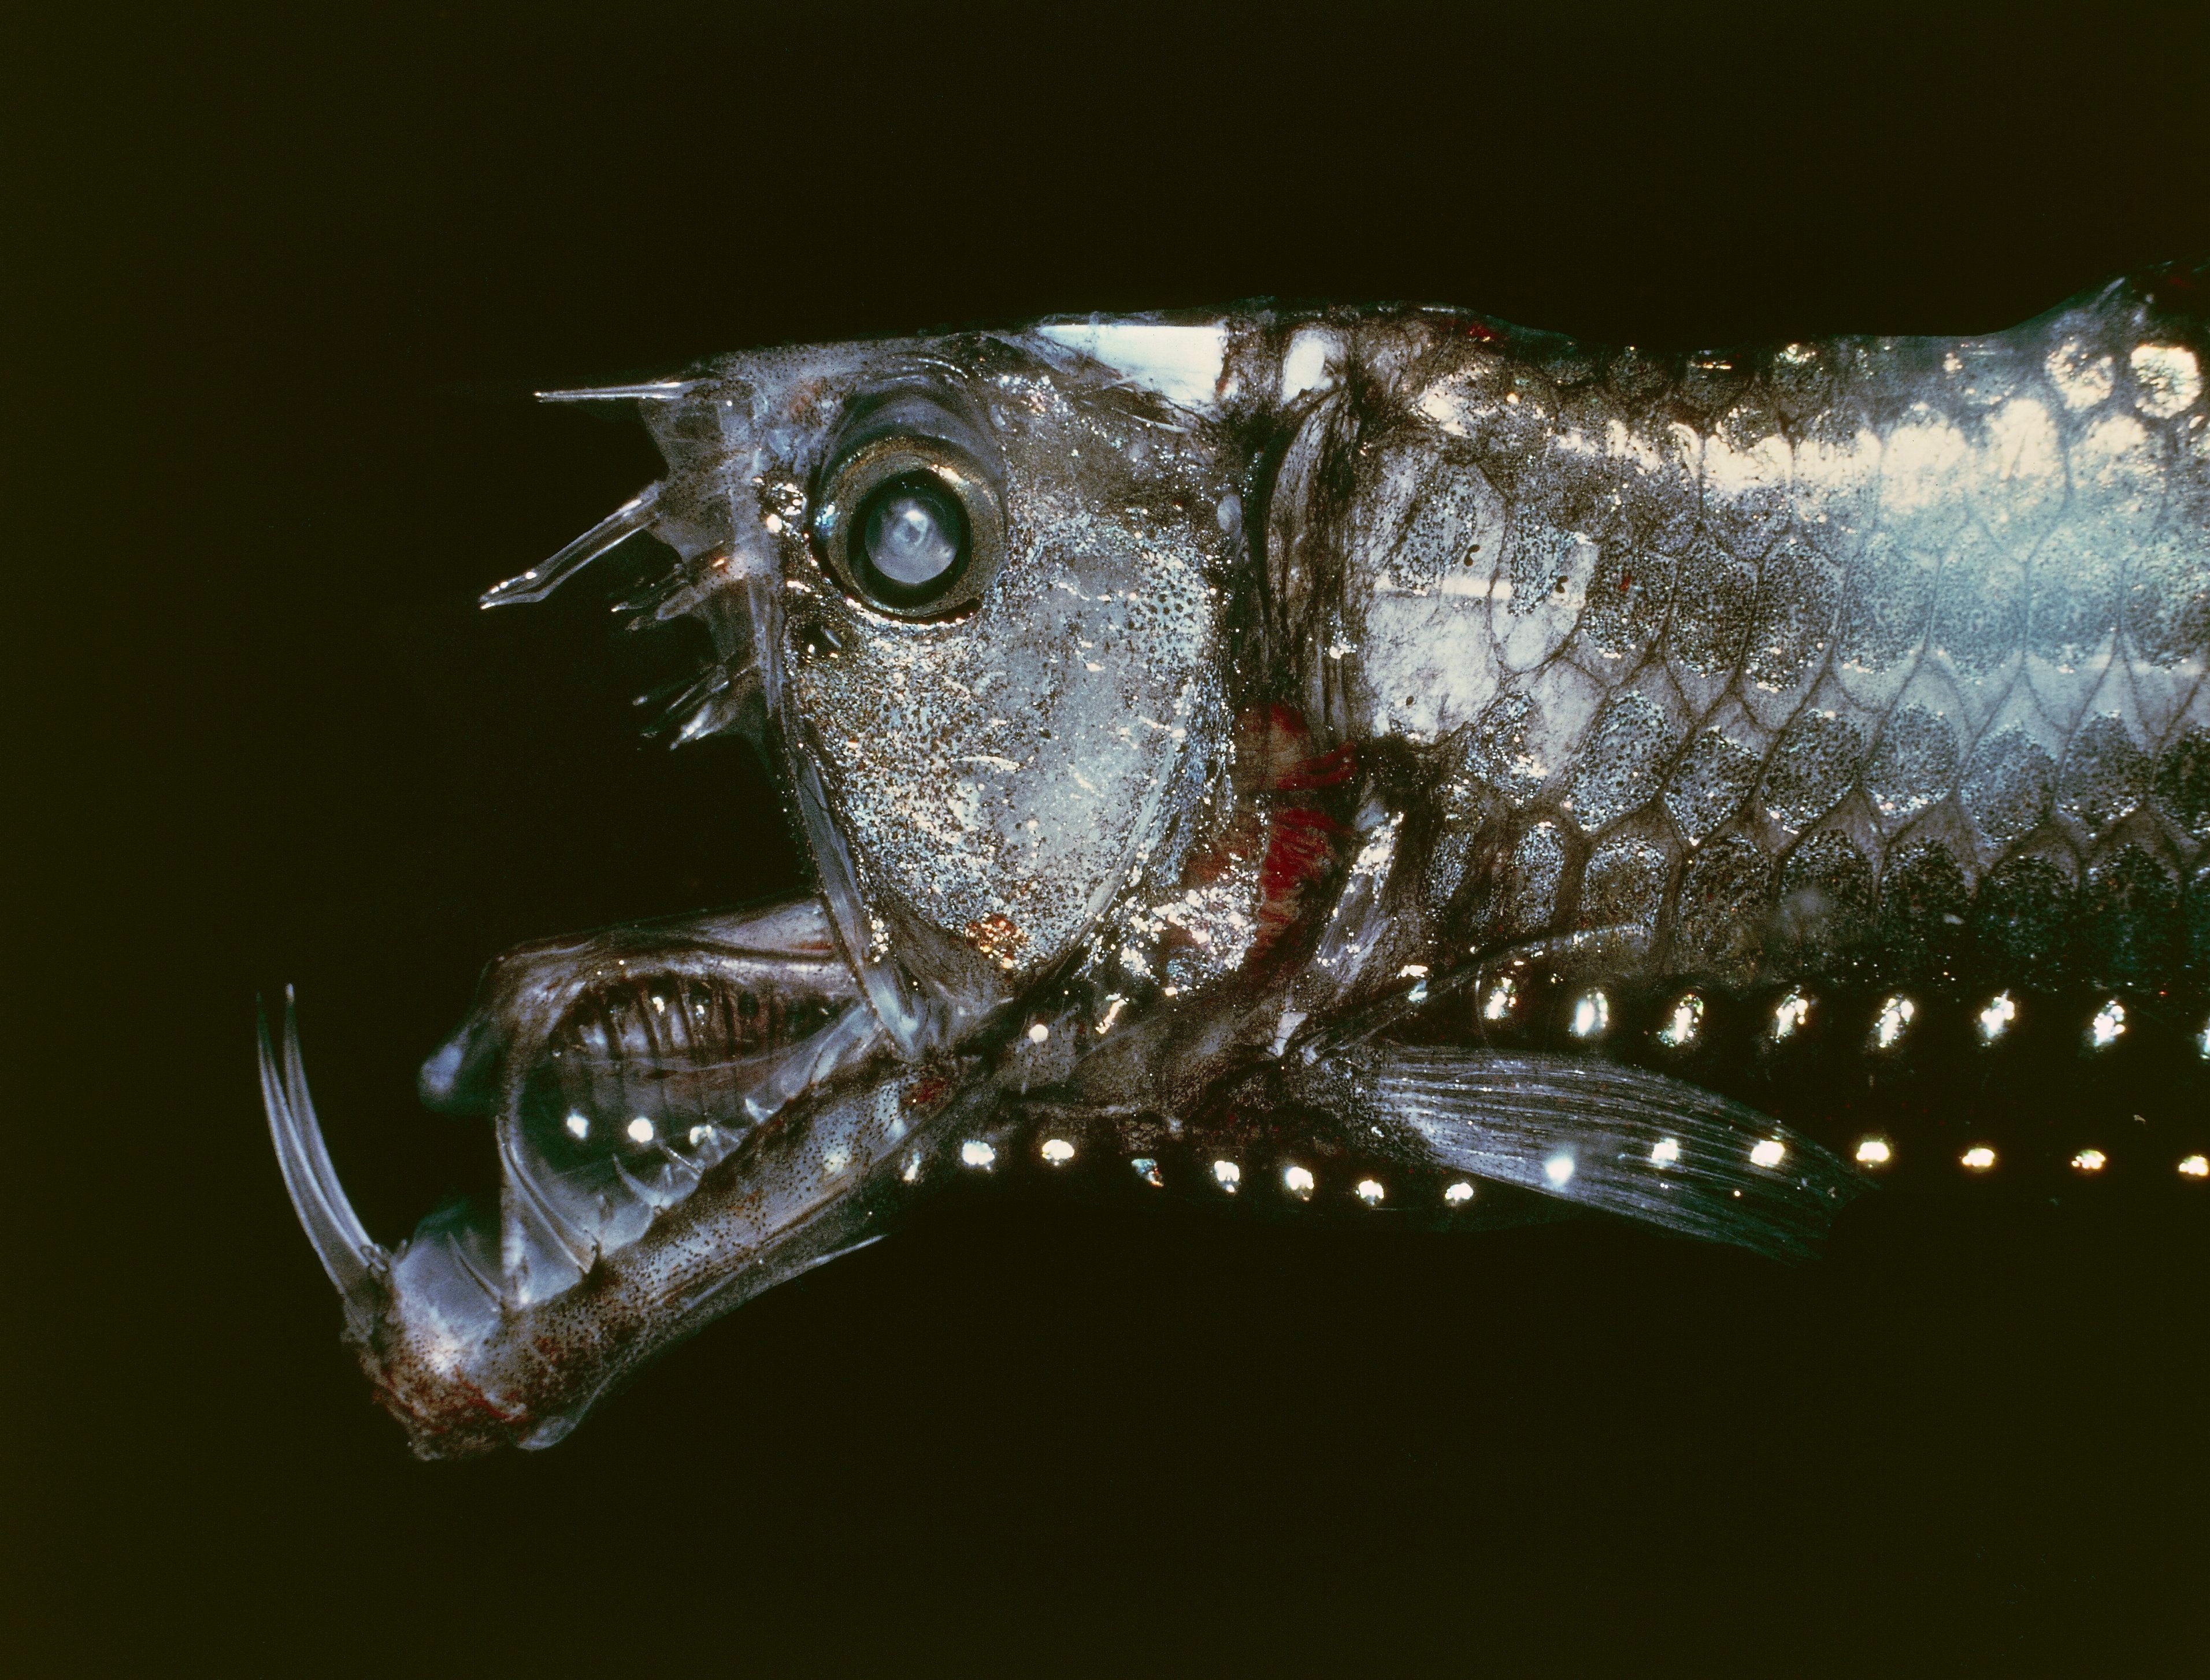 deep sea creatures anglerfish - HD1910×1000